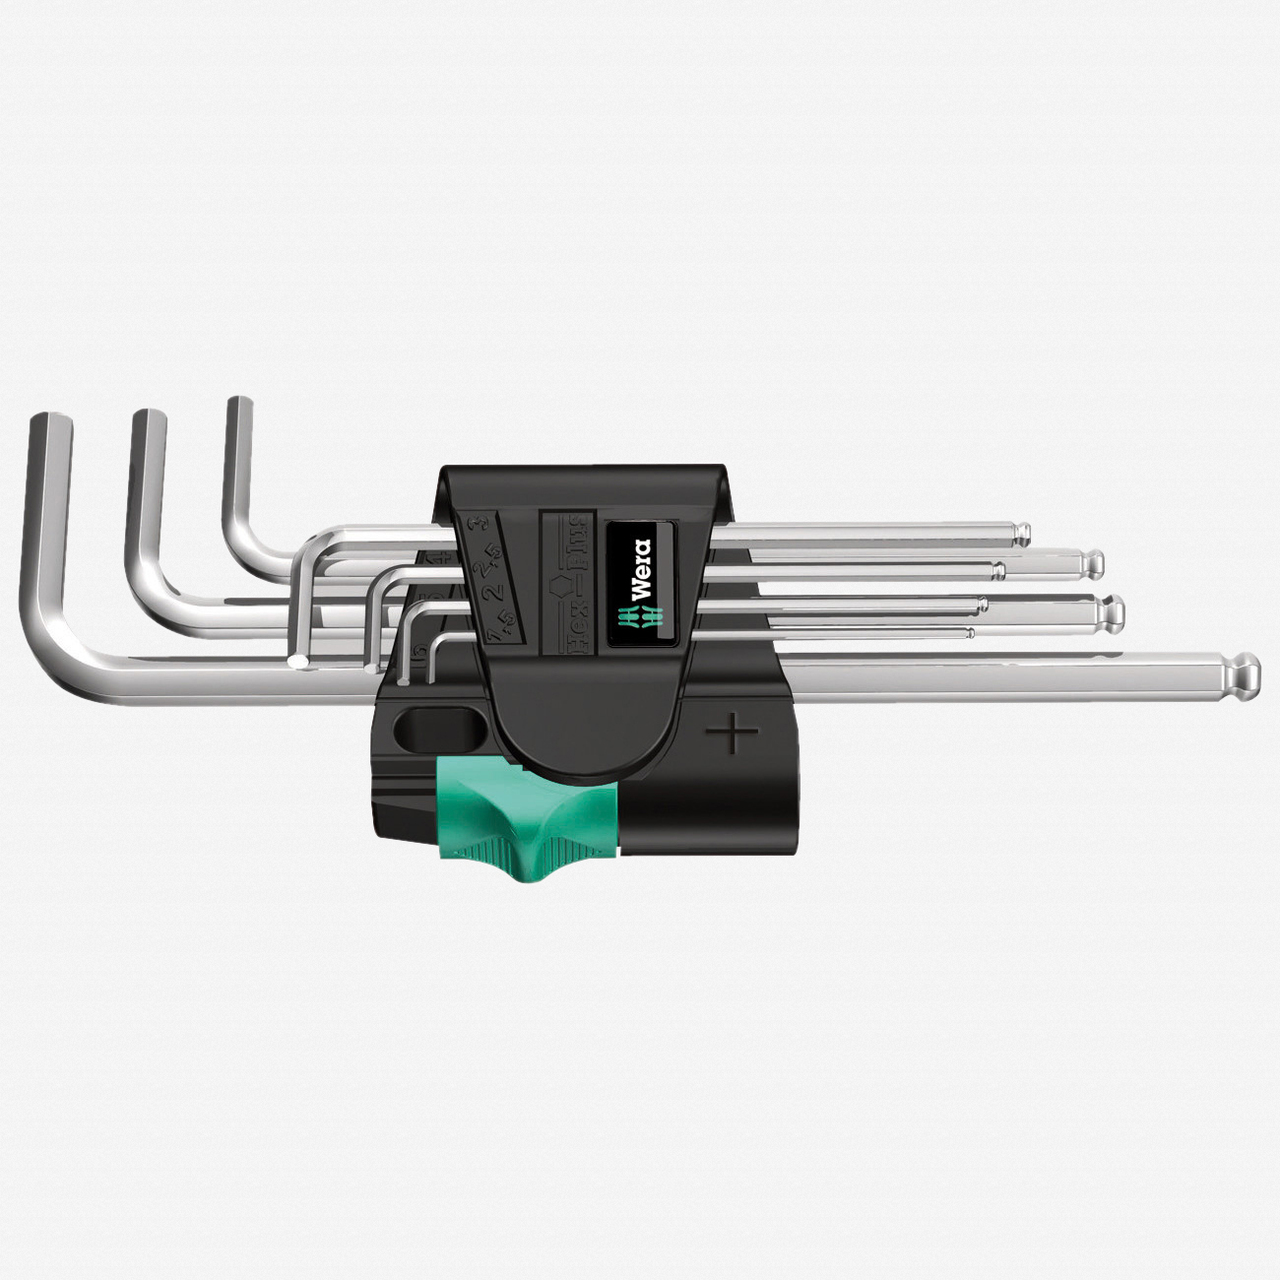 Wera 022181 Chrome Ball End Hex Metric L-key Set - KC Tool